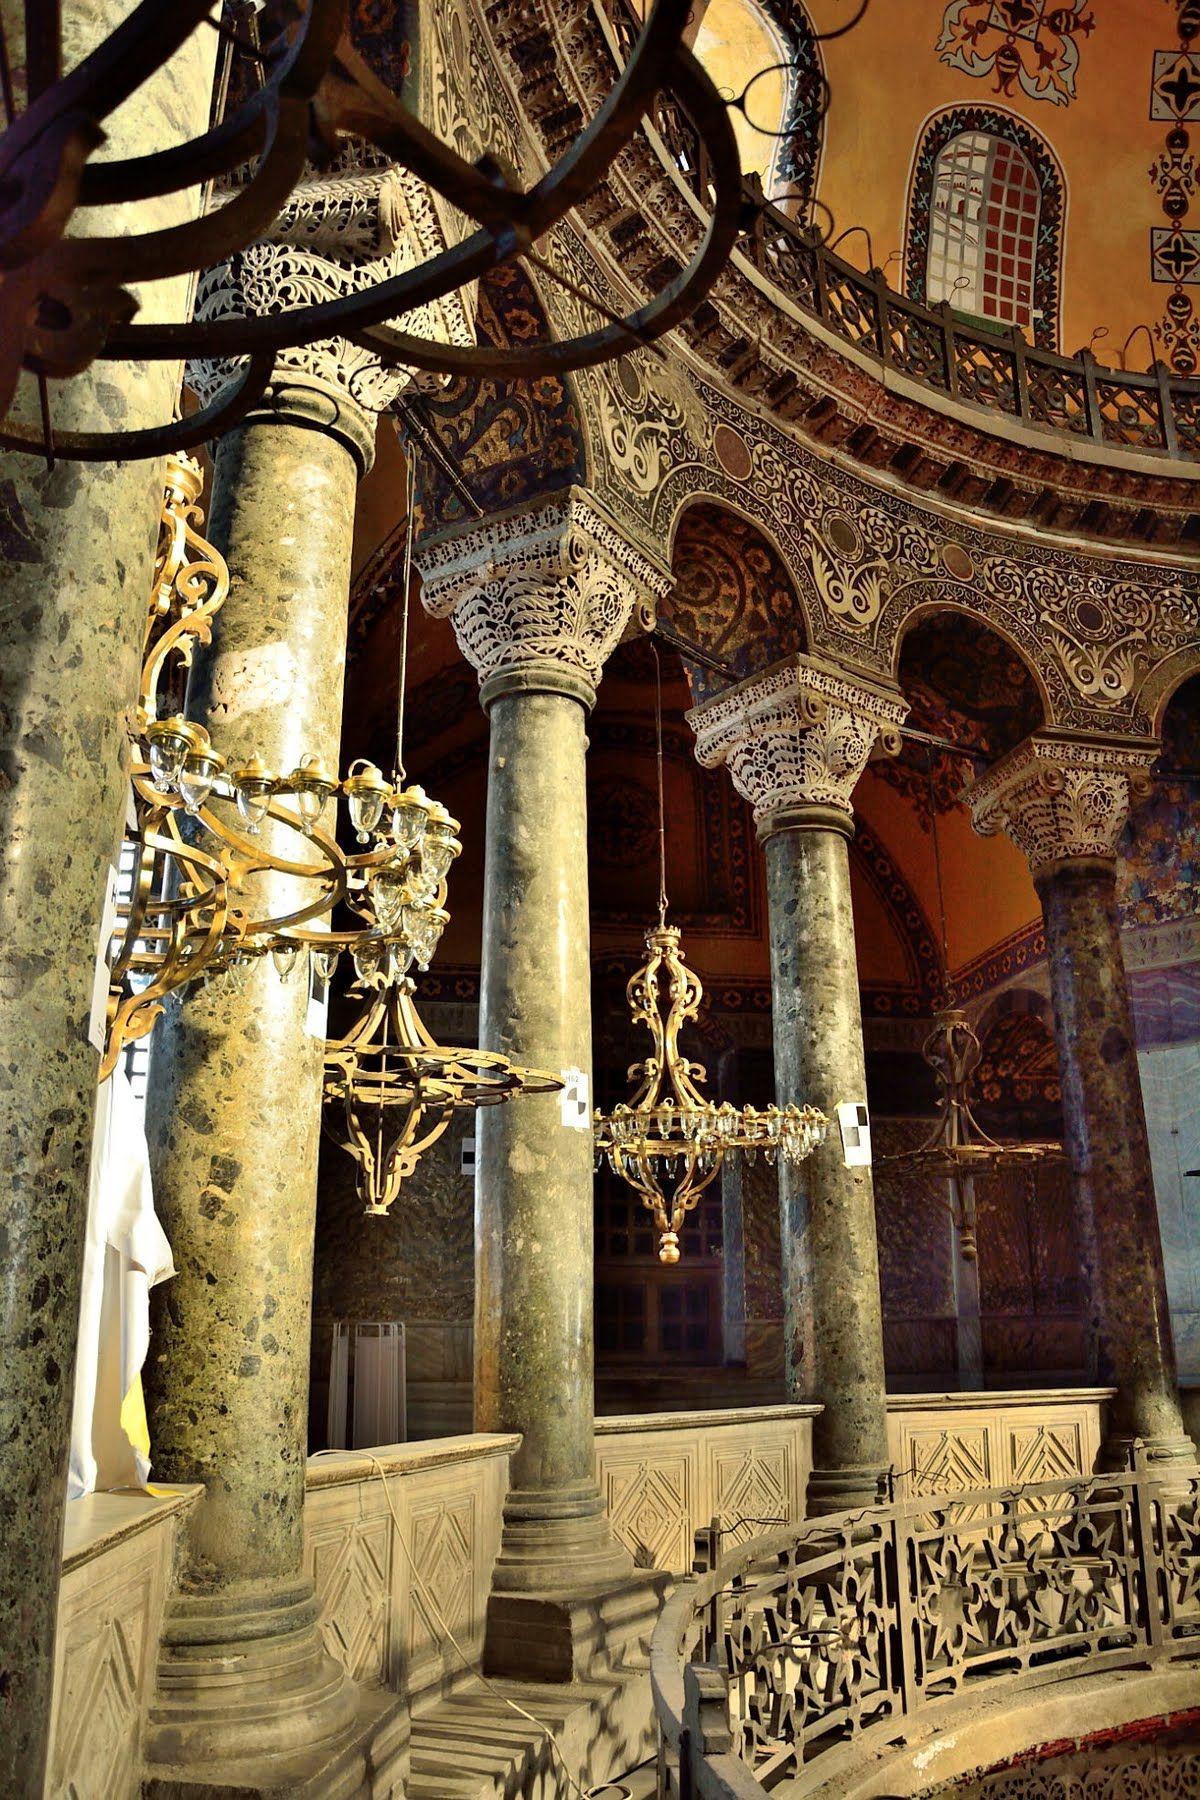 Columns Of Hagia Sophia With Images Hagia Sophia Byzantine